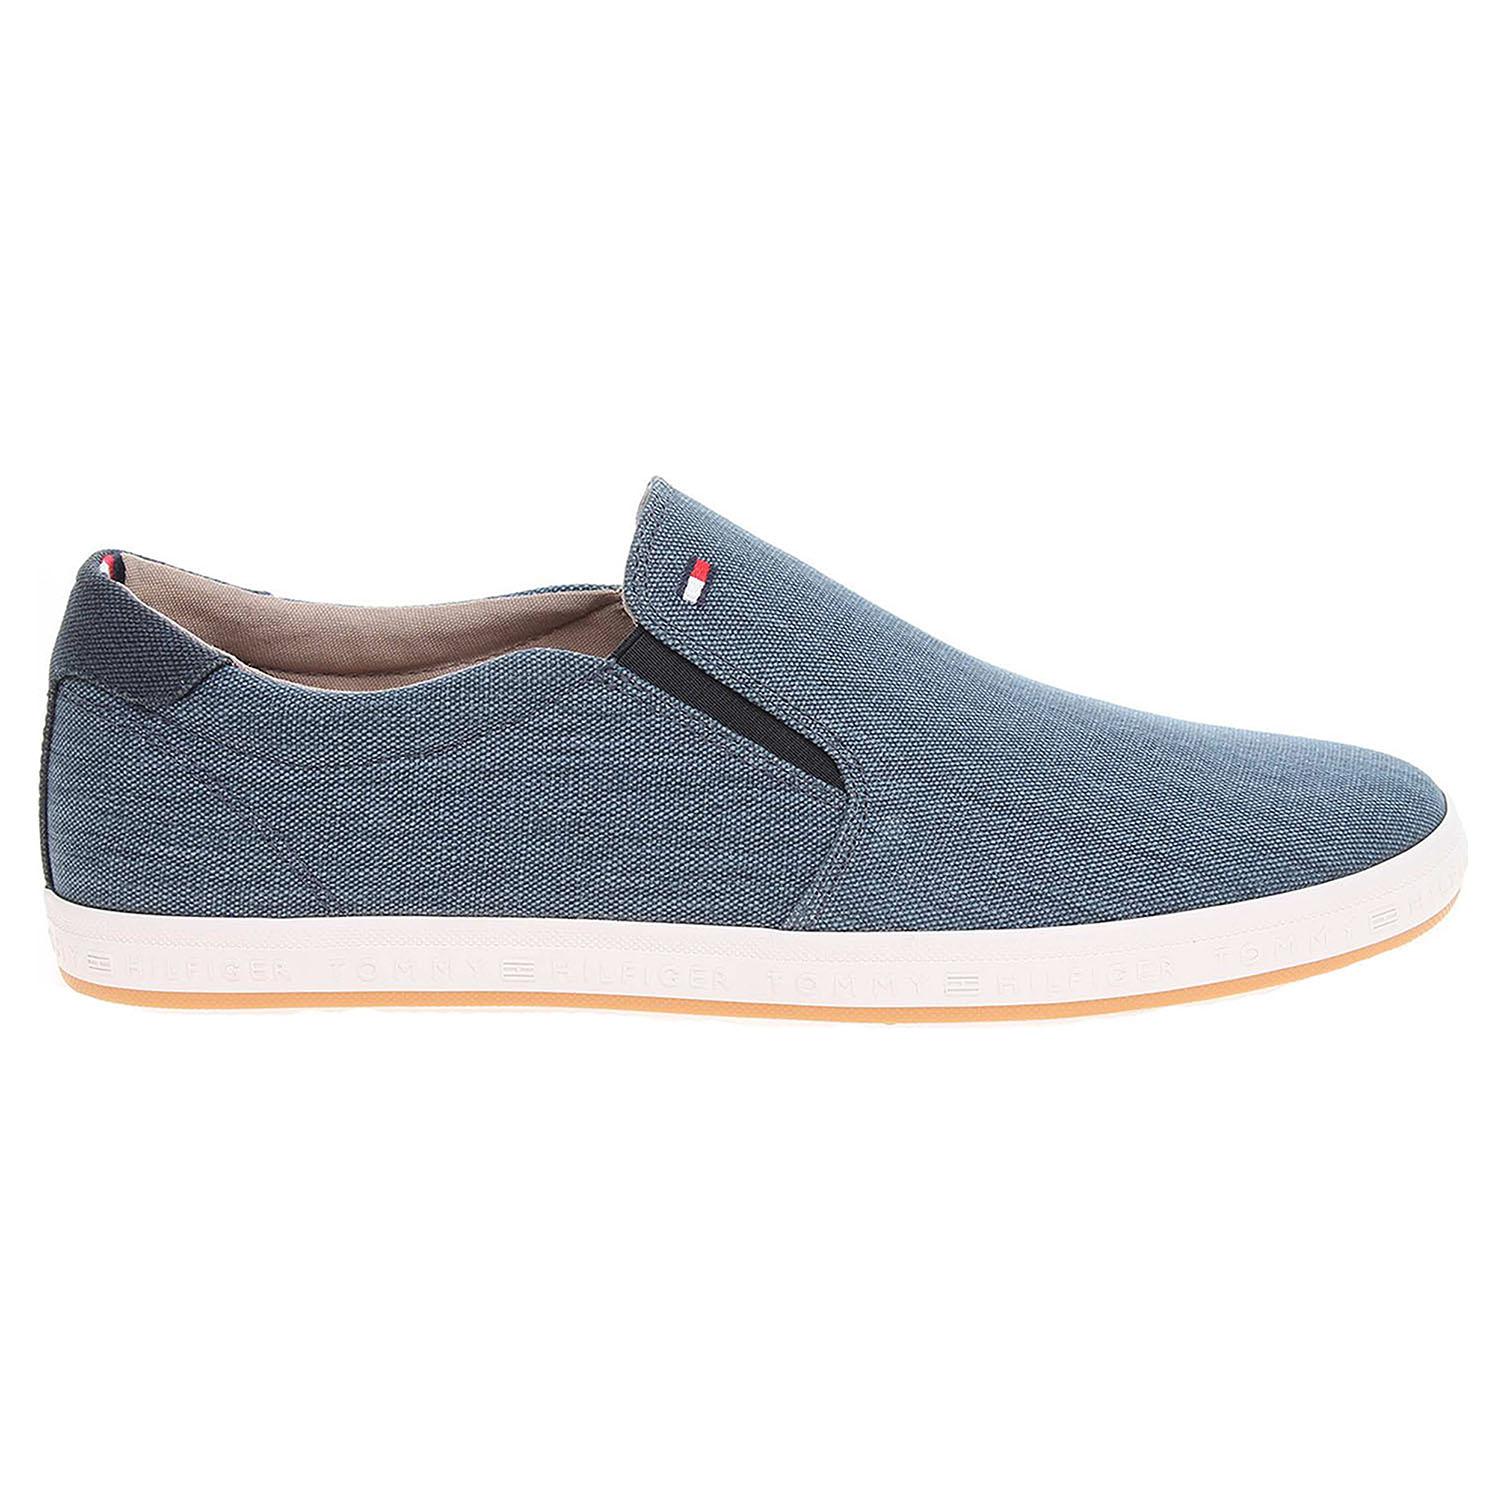 Ecco Tommy Hilfiger pánská obuv FM0FM00409 H2285OWELL jeans 24000455 74833220ec6